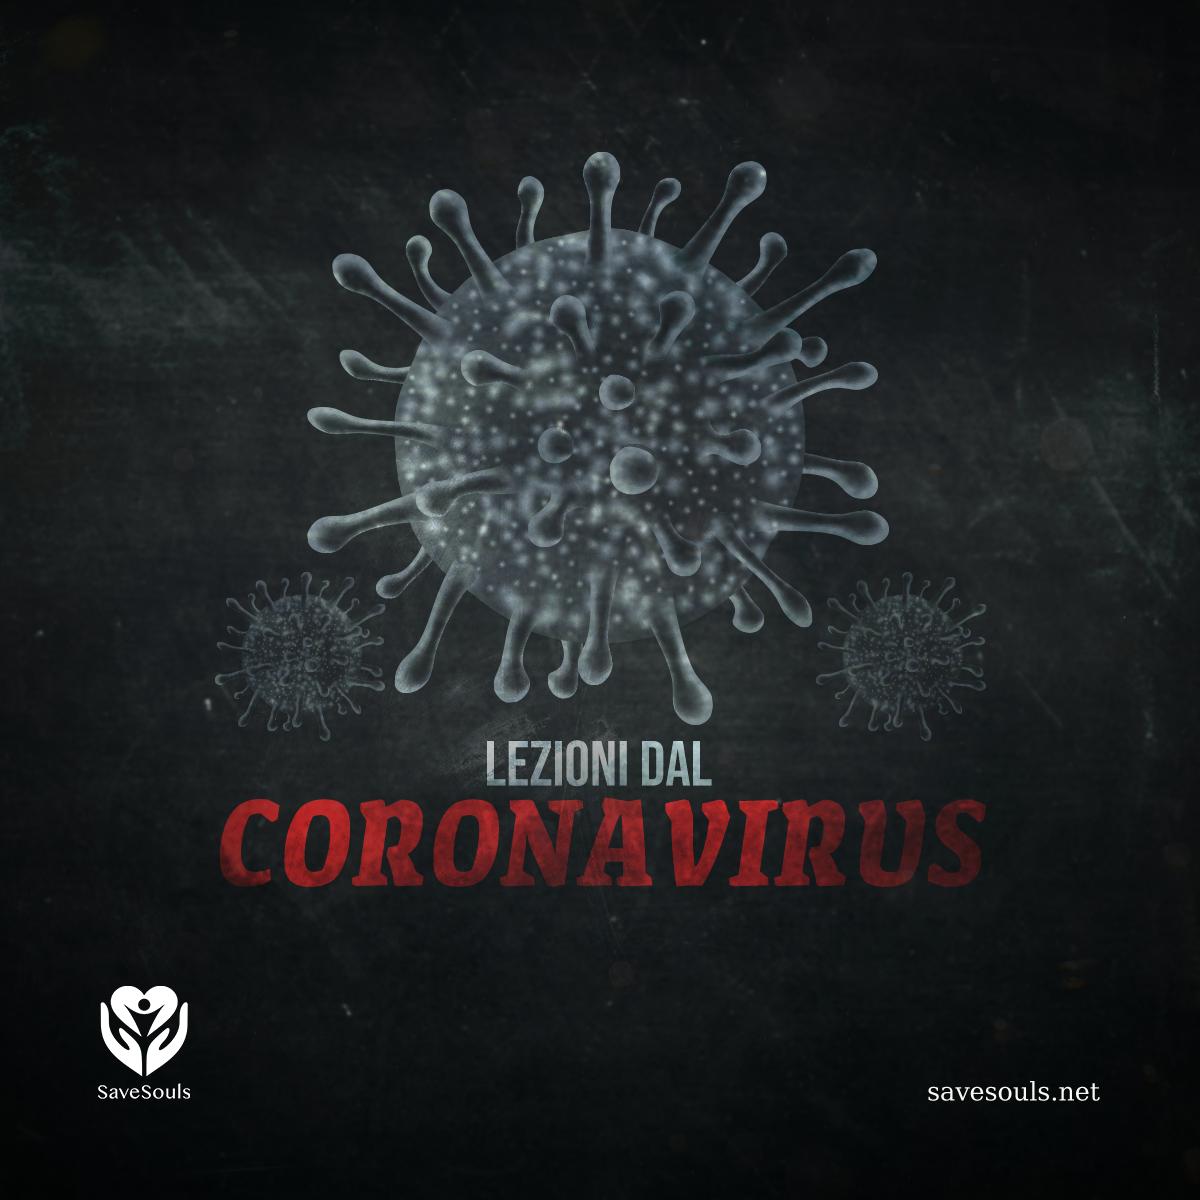 Lezioni dal Coronavirus